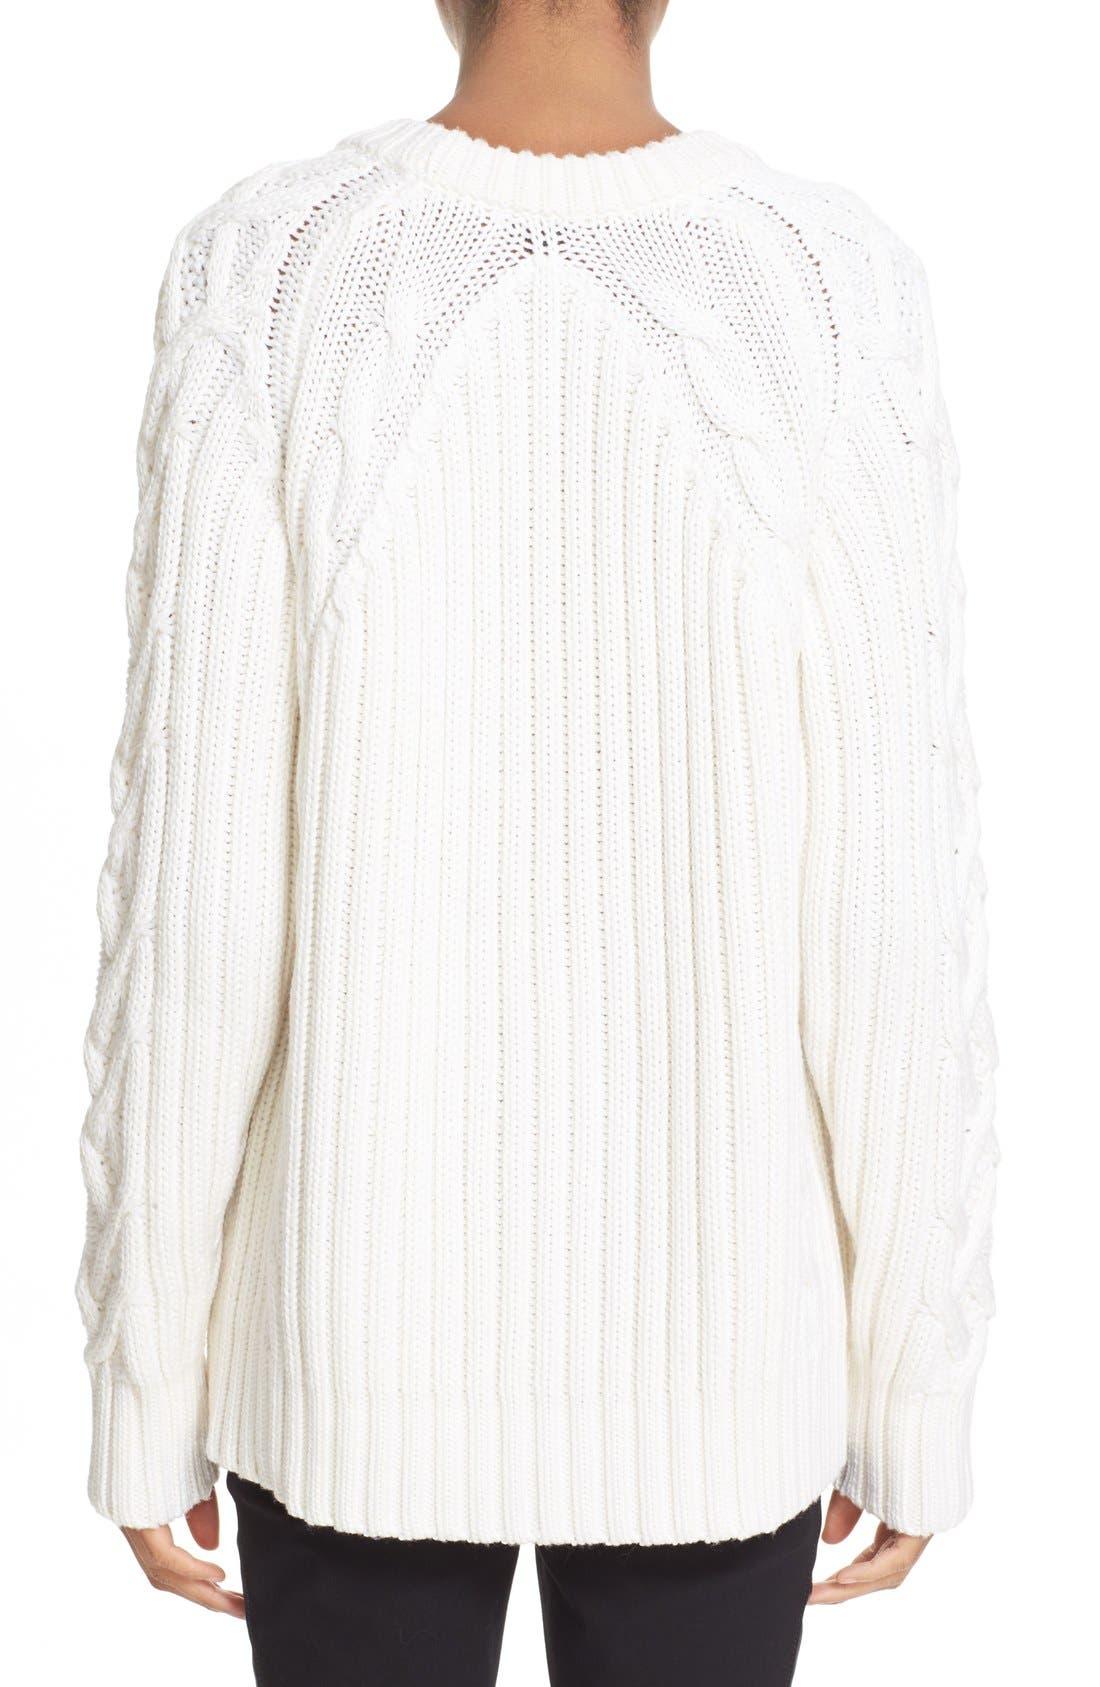 Alternate Image 2  - rag & bone 'Kiera' Cable Knit Crewneck Sweater